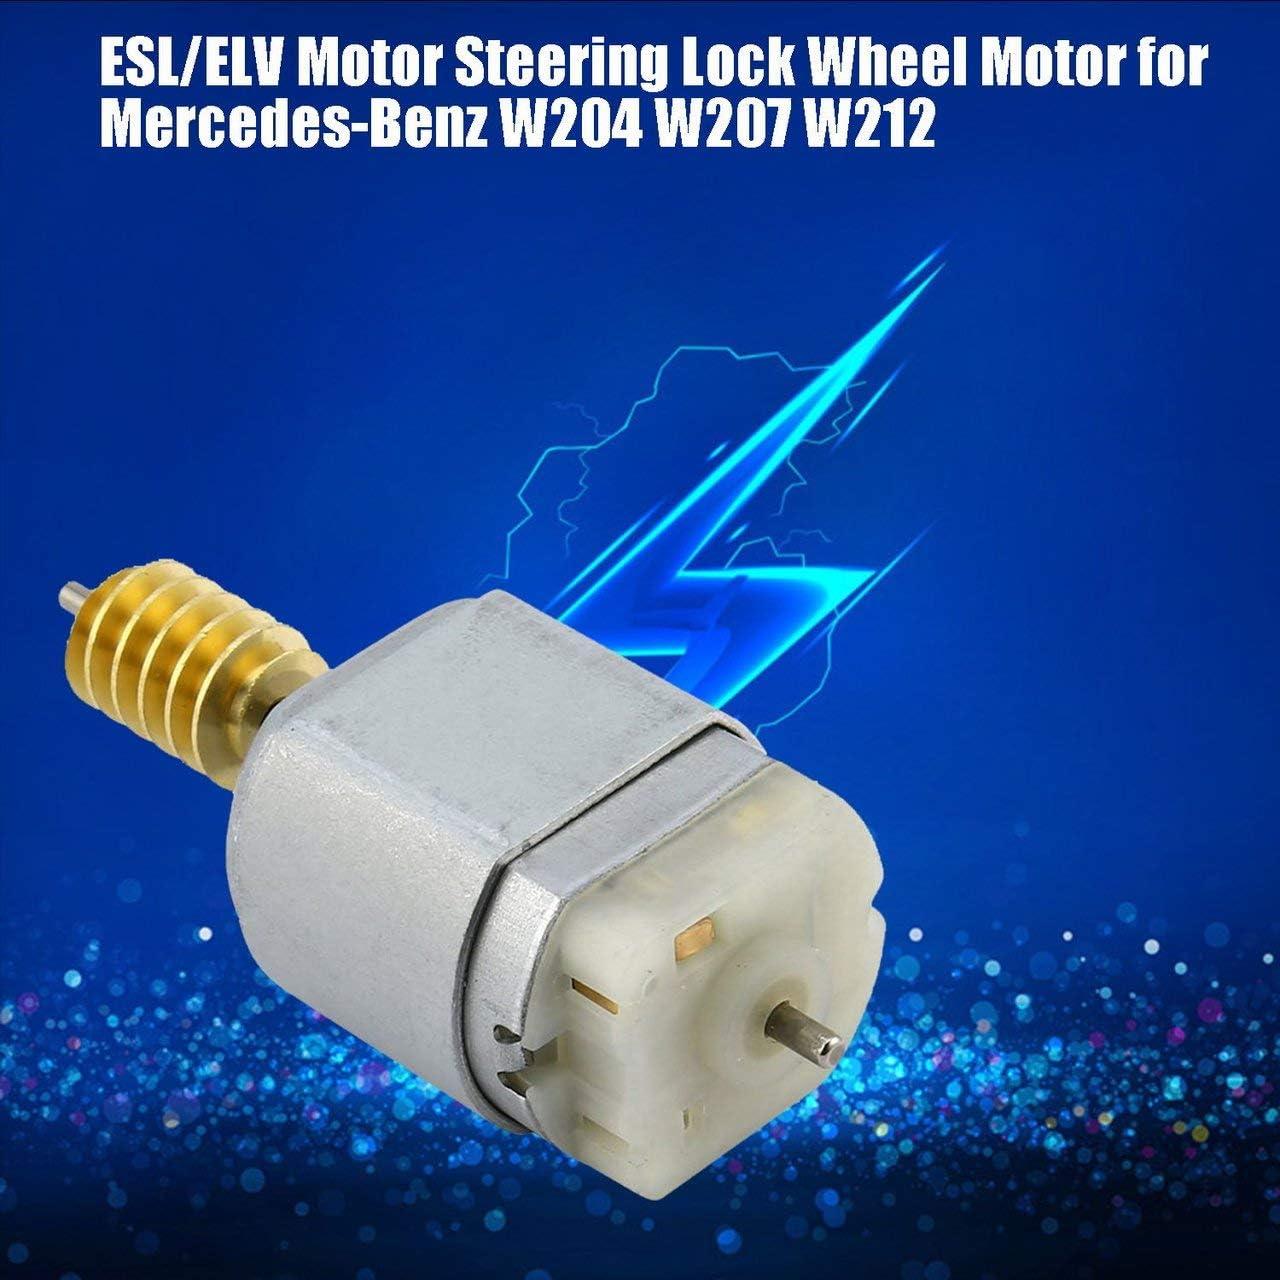 Silber ESL//ELV Motor Lenkradschloss Motoren Zubeh/ör Werkzeuge Ersatz F/ür Mercedes Benz W204 W207 W212 E /& C Serie DEjasnyfall